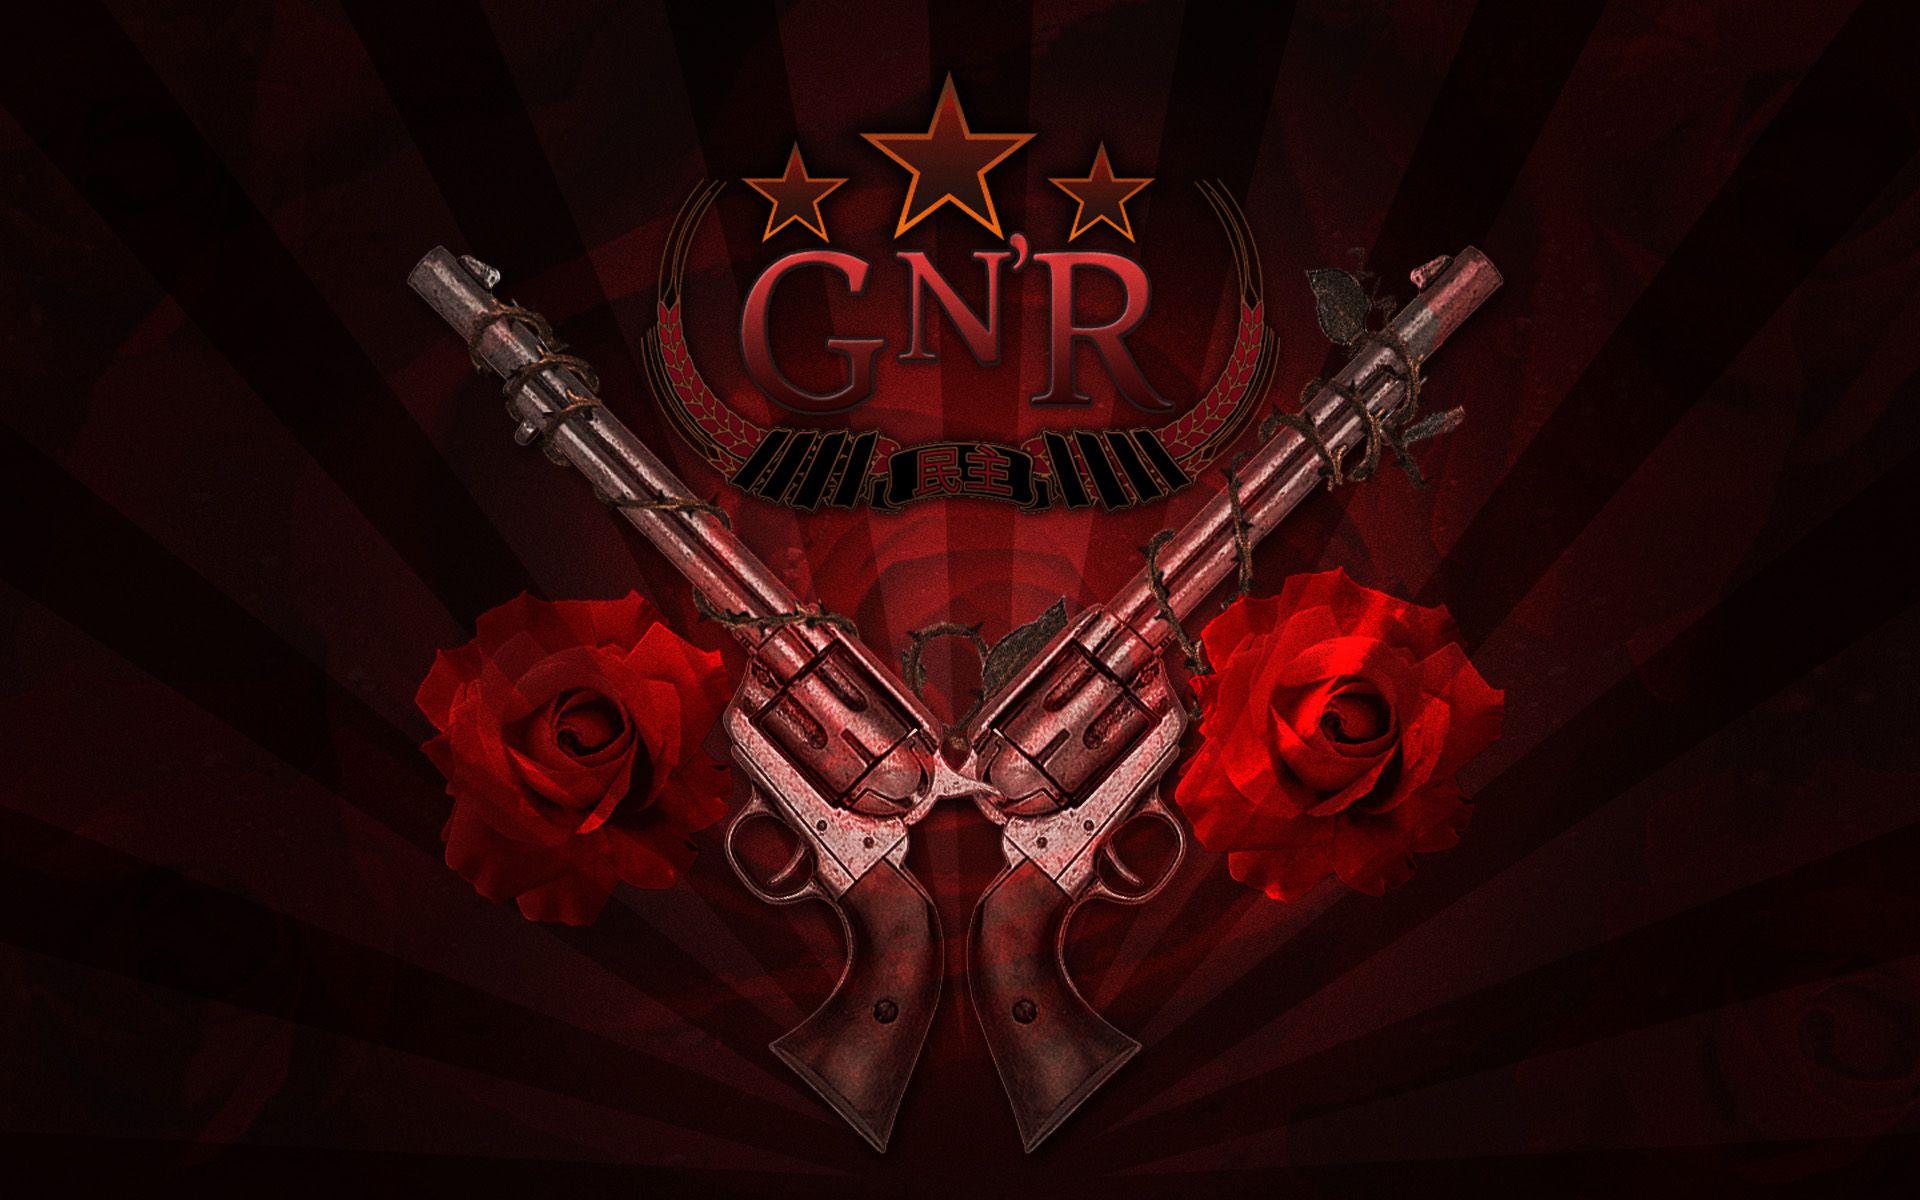 Guns N Roses Hd Wallpapers Backgrounds Wallpaper Rose Wallpaper